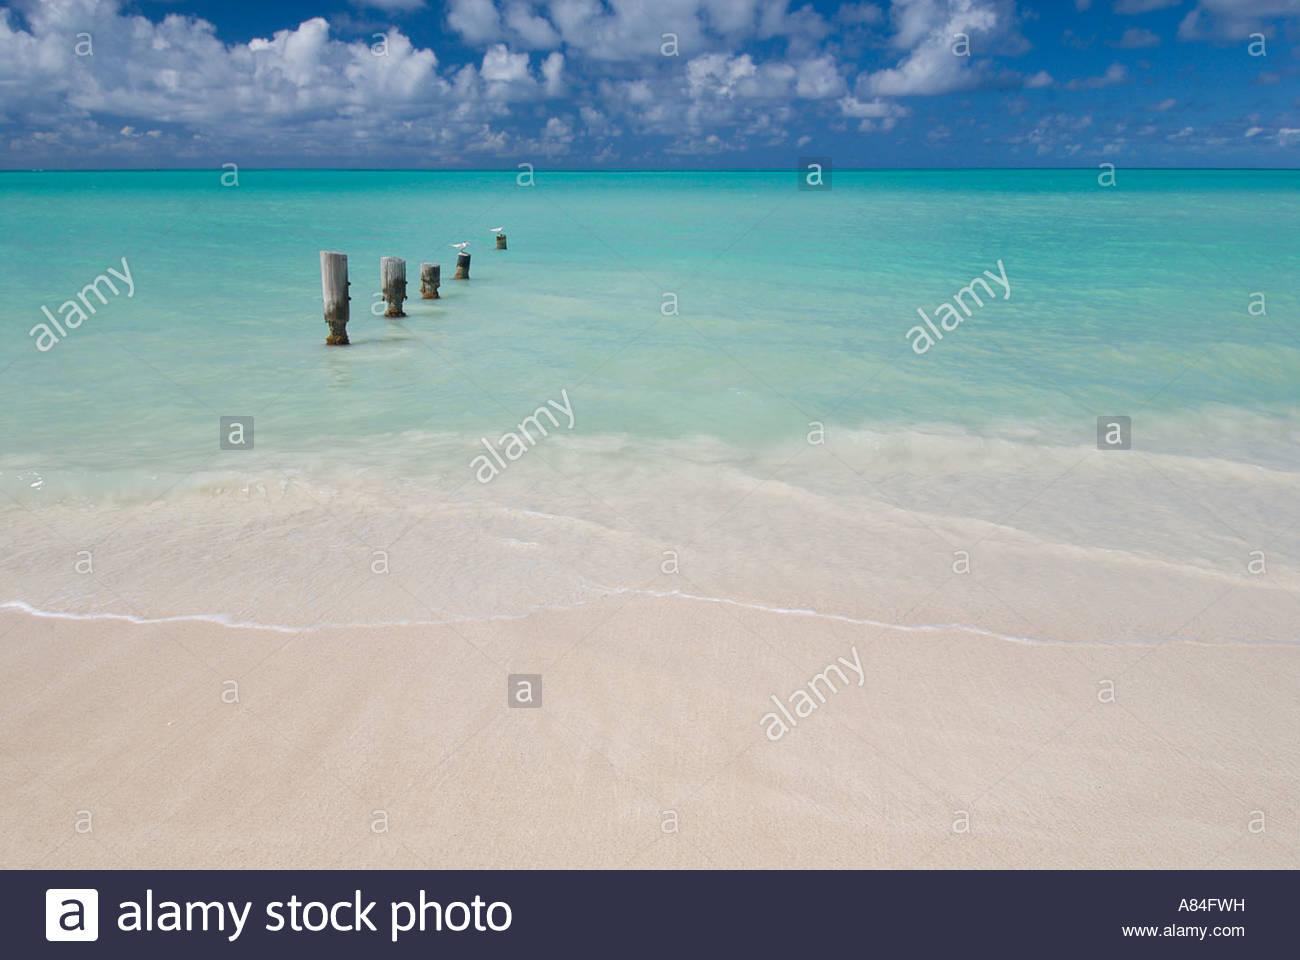 Wooden posts in the sea at Dickenson Bay, Antigua, Leeward Islands, Caribbean - Stock Image